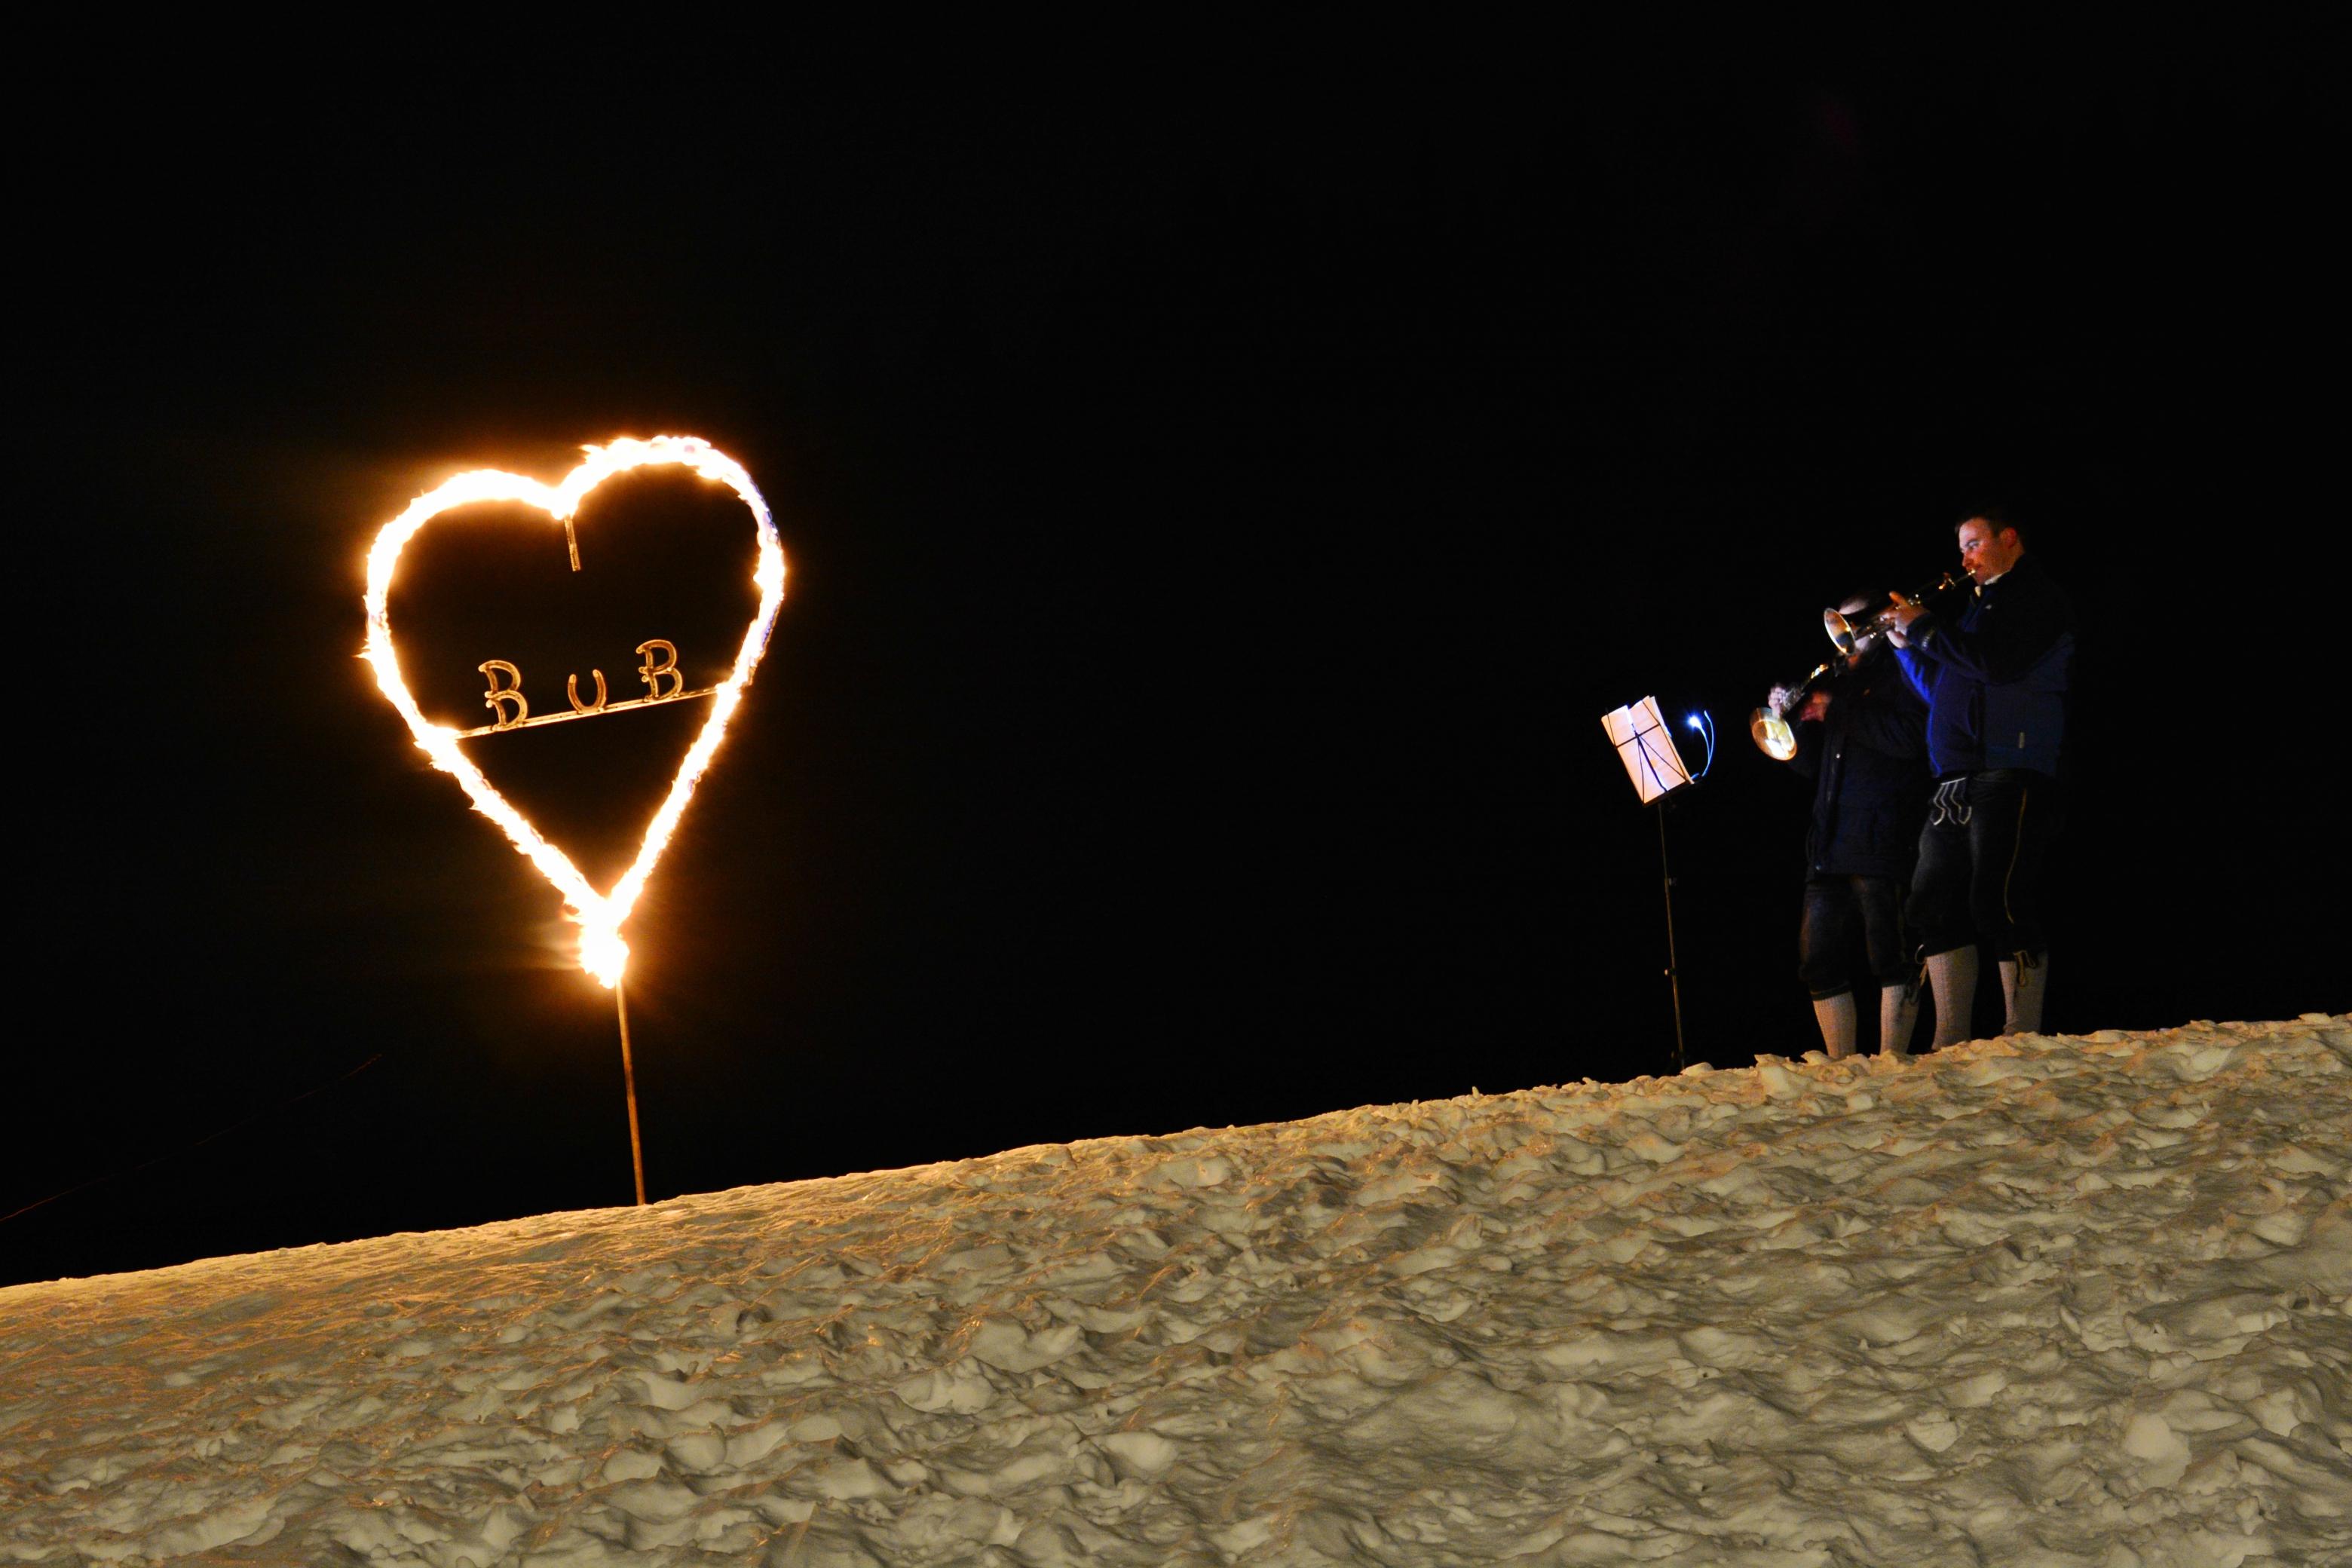 O0118 Flammendes Herz an der Stubentalalm 2017.jpg